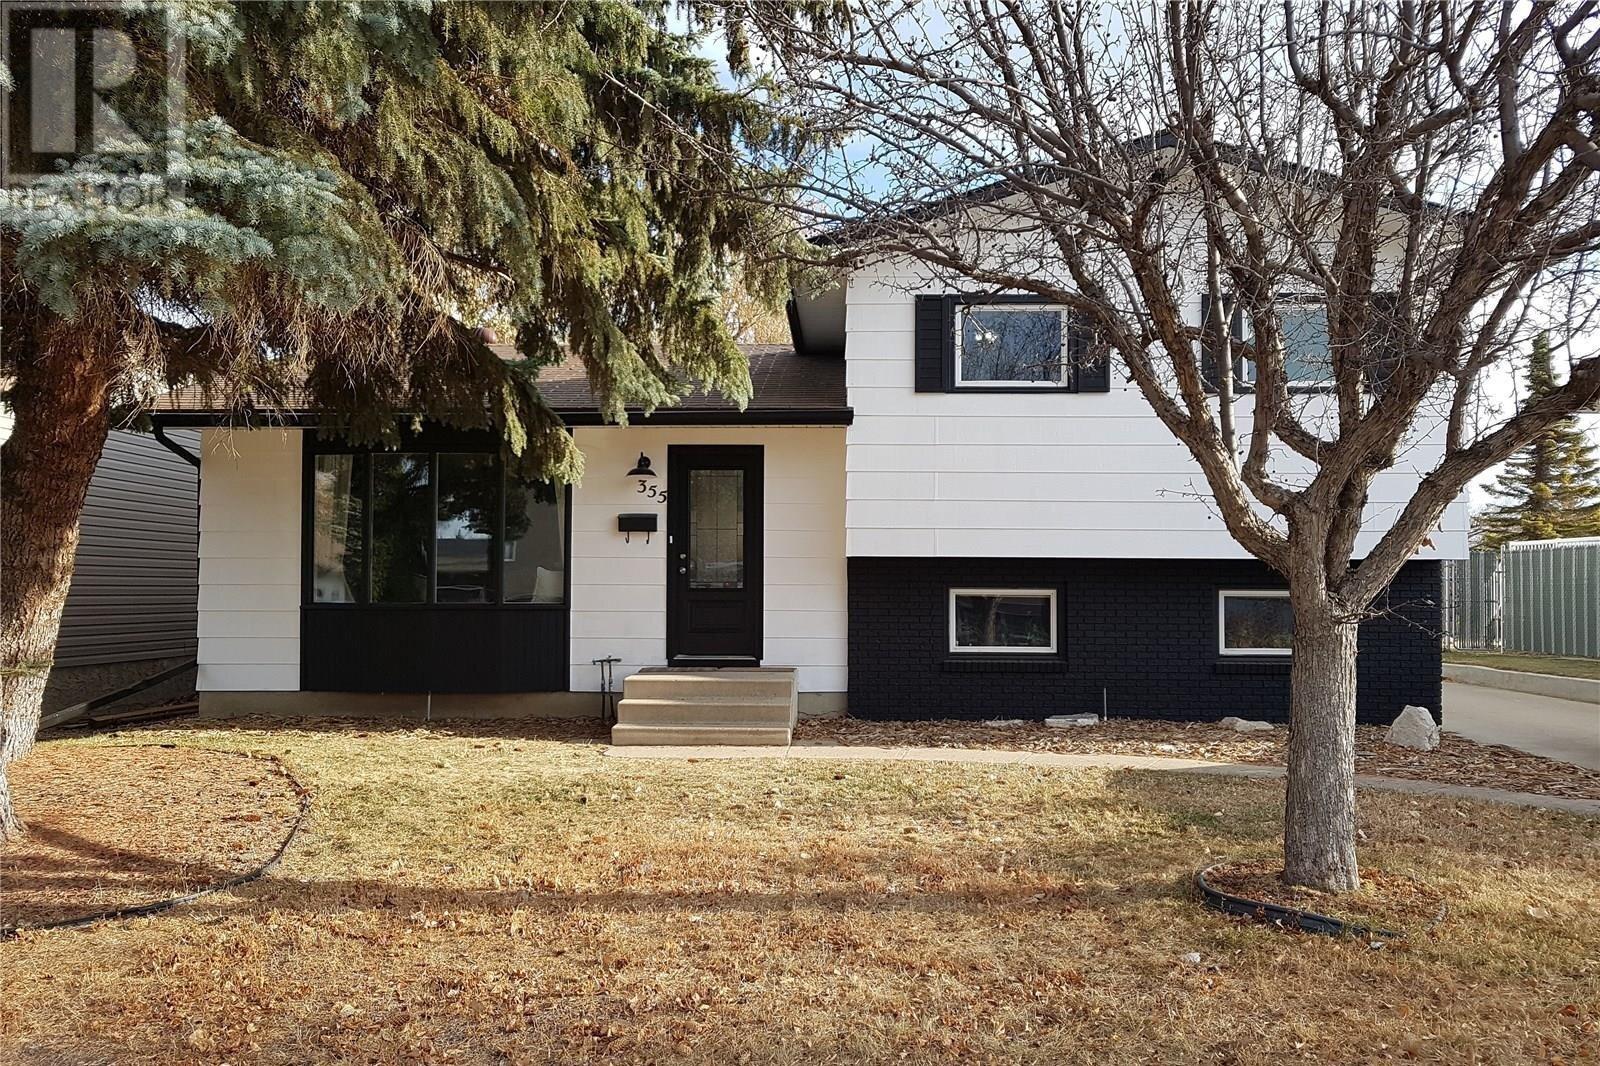 House for sale at 355 Charlebois Cres Saskatoon Saskatchewan - MLS: SK837650